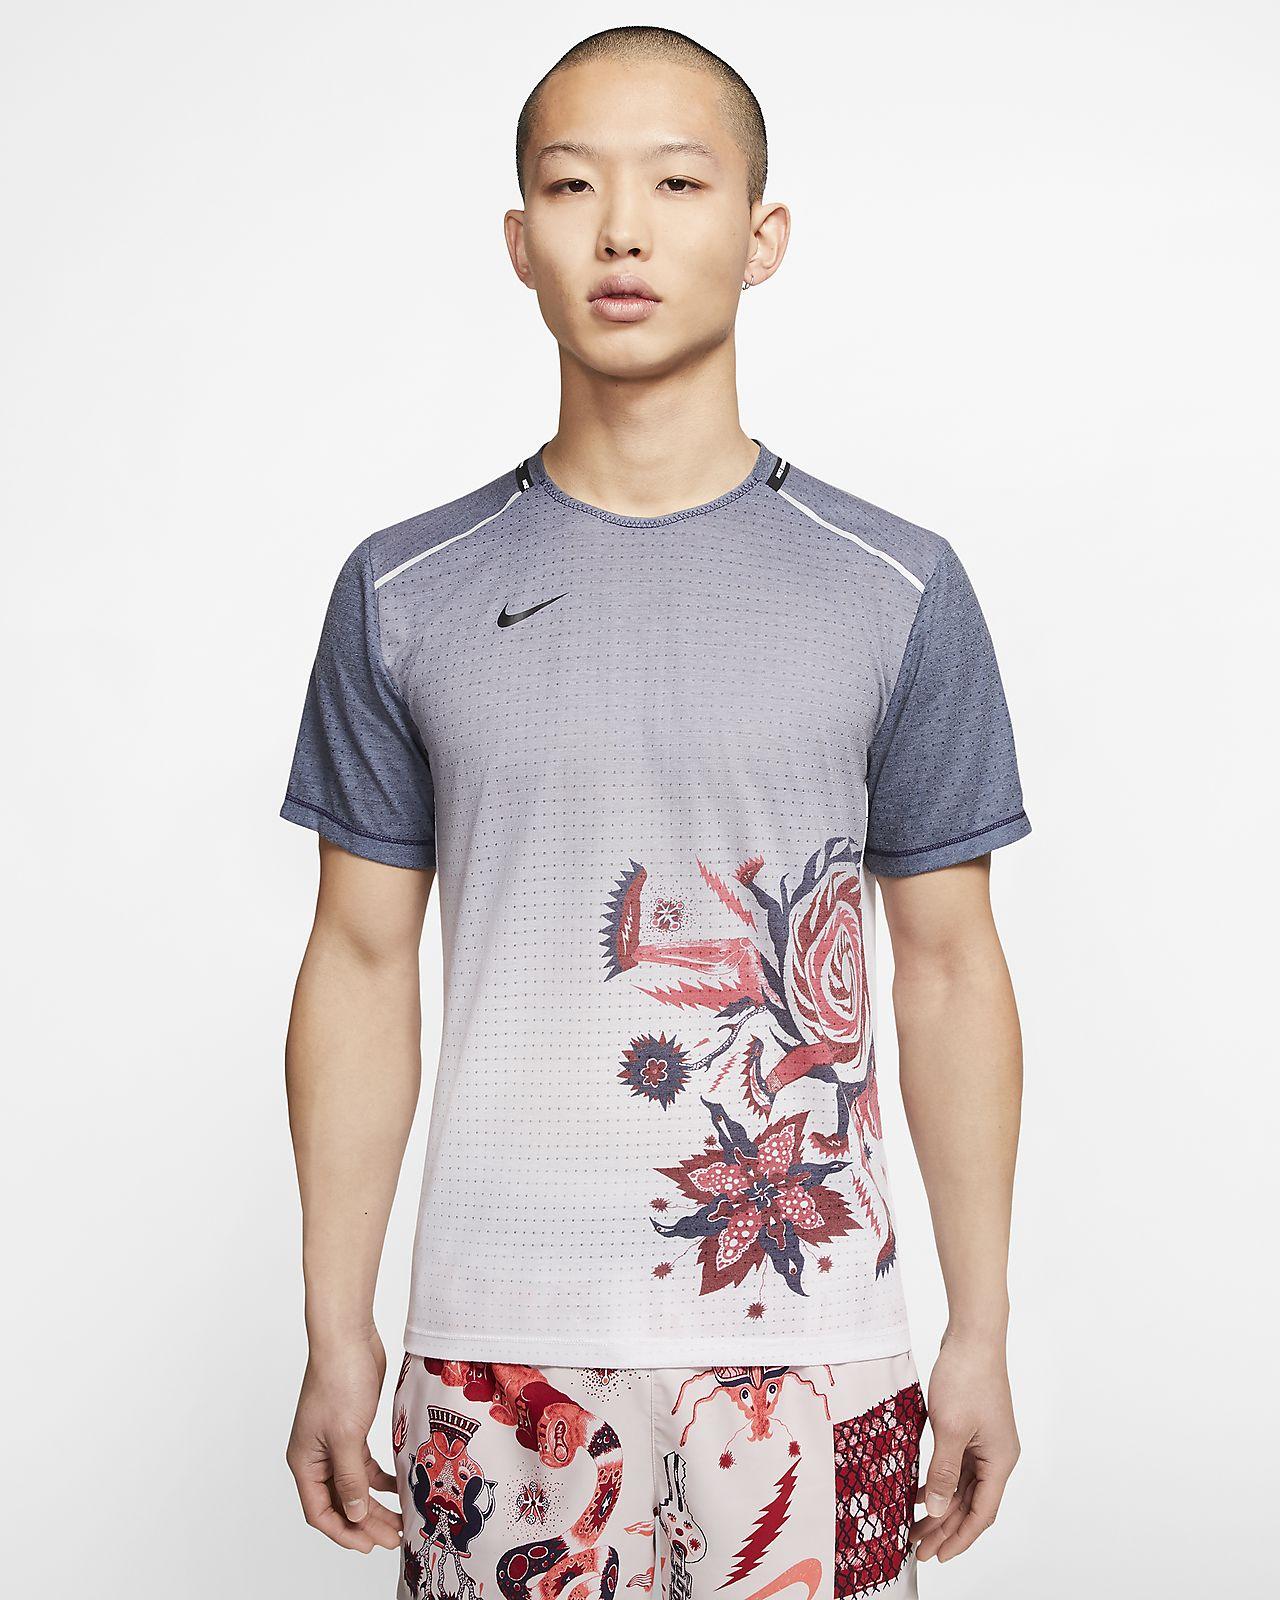 Nike Rise 365 Wild Run Men's Running Top